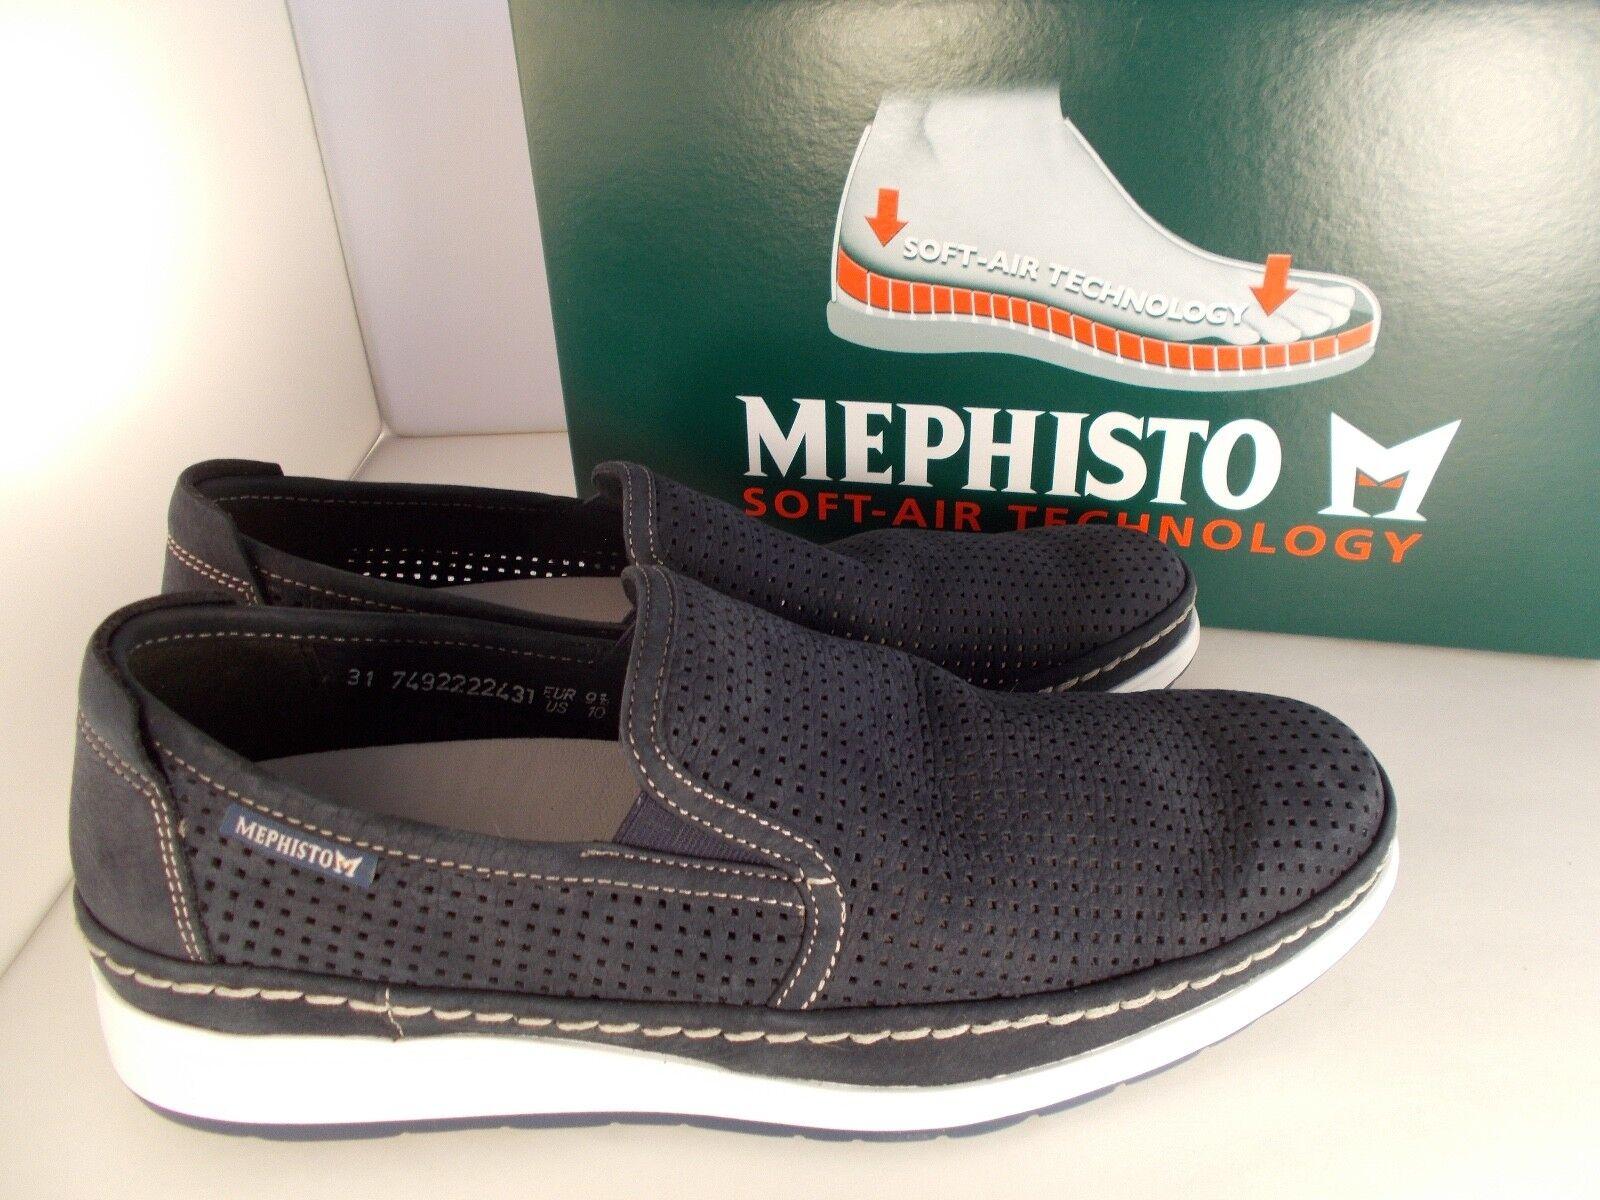 62d60d45fa Mephisto Hadrian Perf Navy Sportbuck 1945 Soft-air Men's Shoes Sz 10 for  sale online   eBay